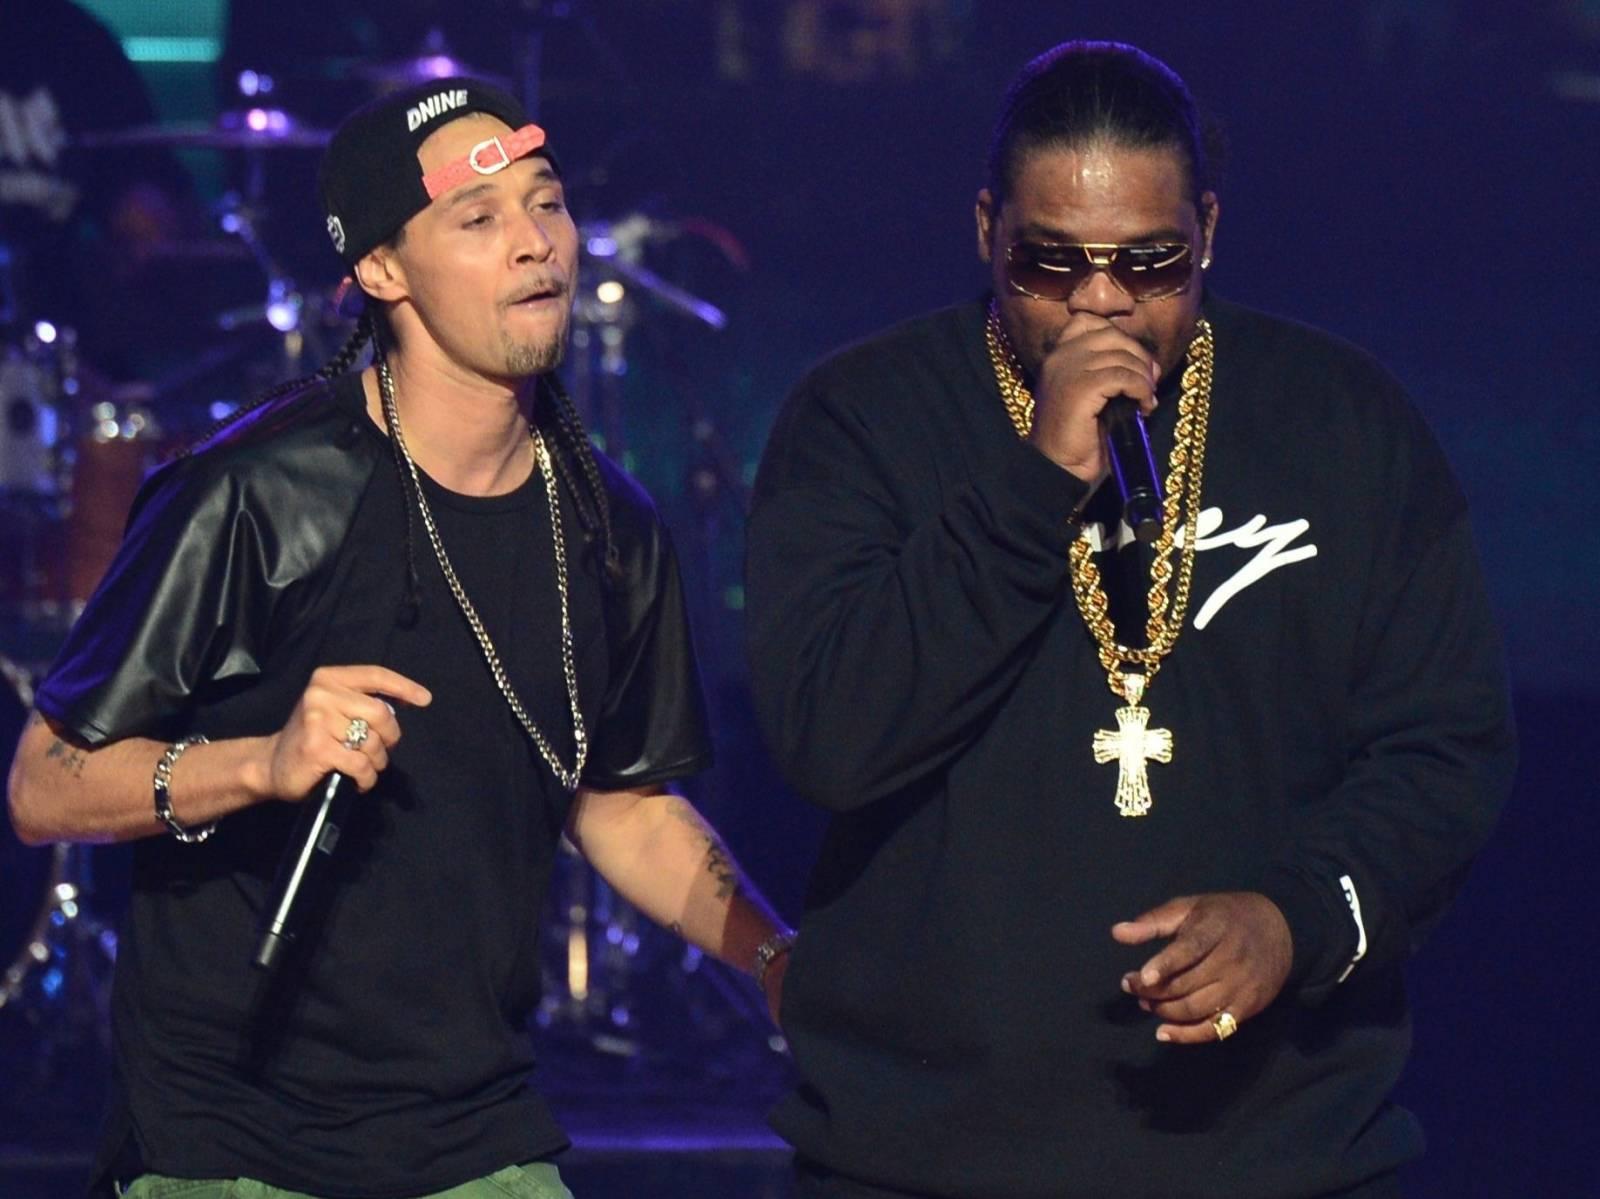 Bone Thugs-N-Harmony Tease Name Change After Trying Boneless Buffalo Wild Wings